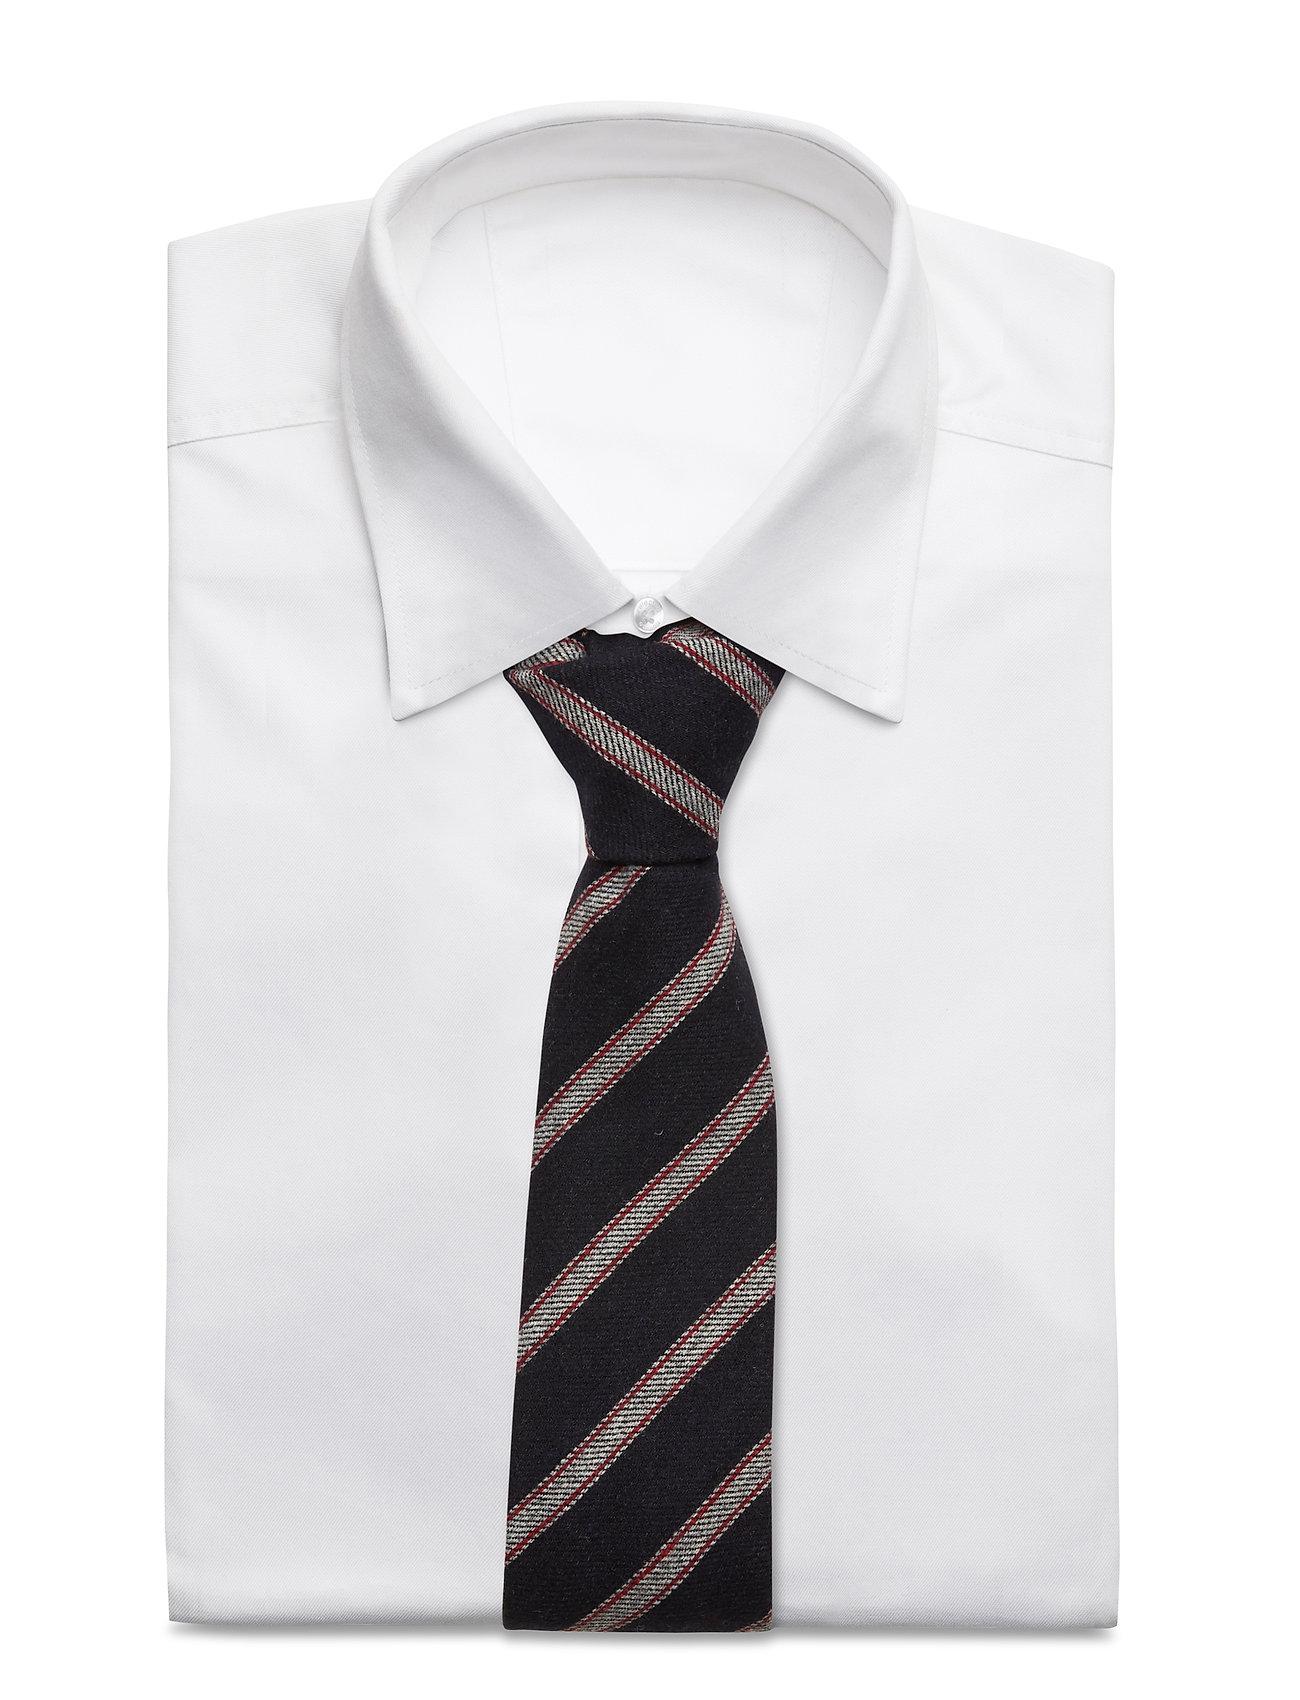 An Ivy - Navy Grey Striped Wool Tie - cravates - navy/grey/red - 1